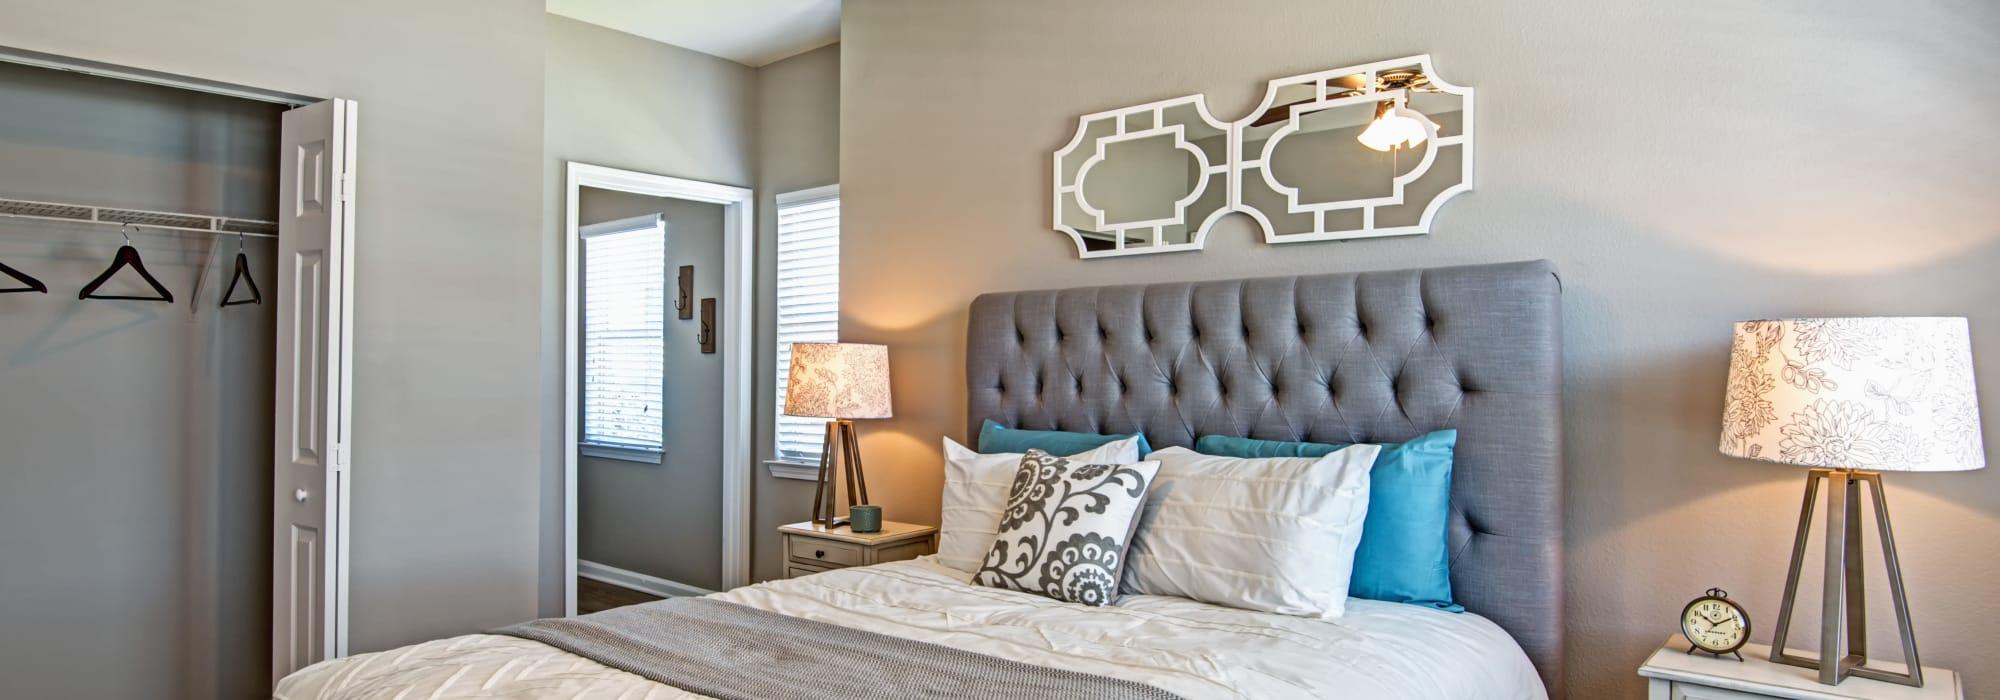 Apartments at The Flats @ 55 Twelve in Durham, North Carolina